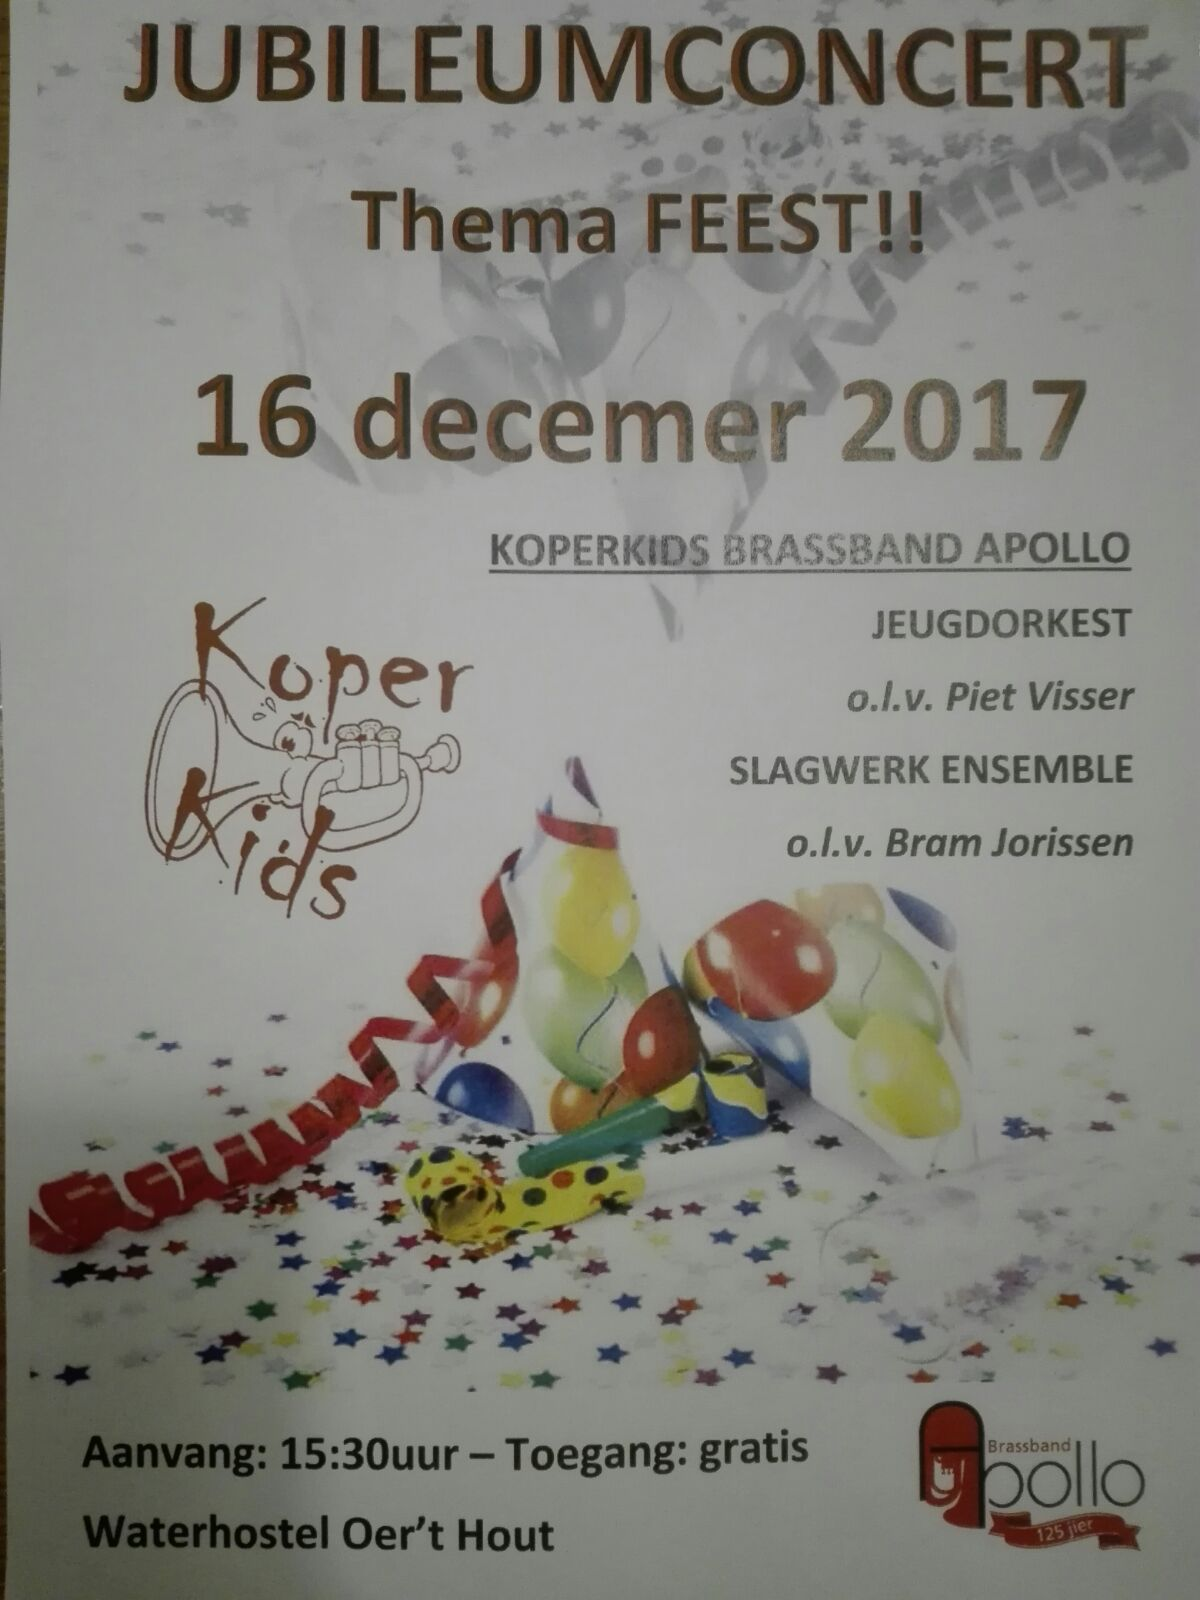 Jubileumconcert KoperKids